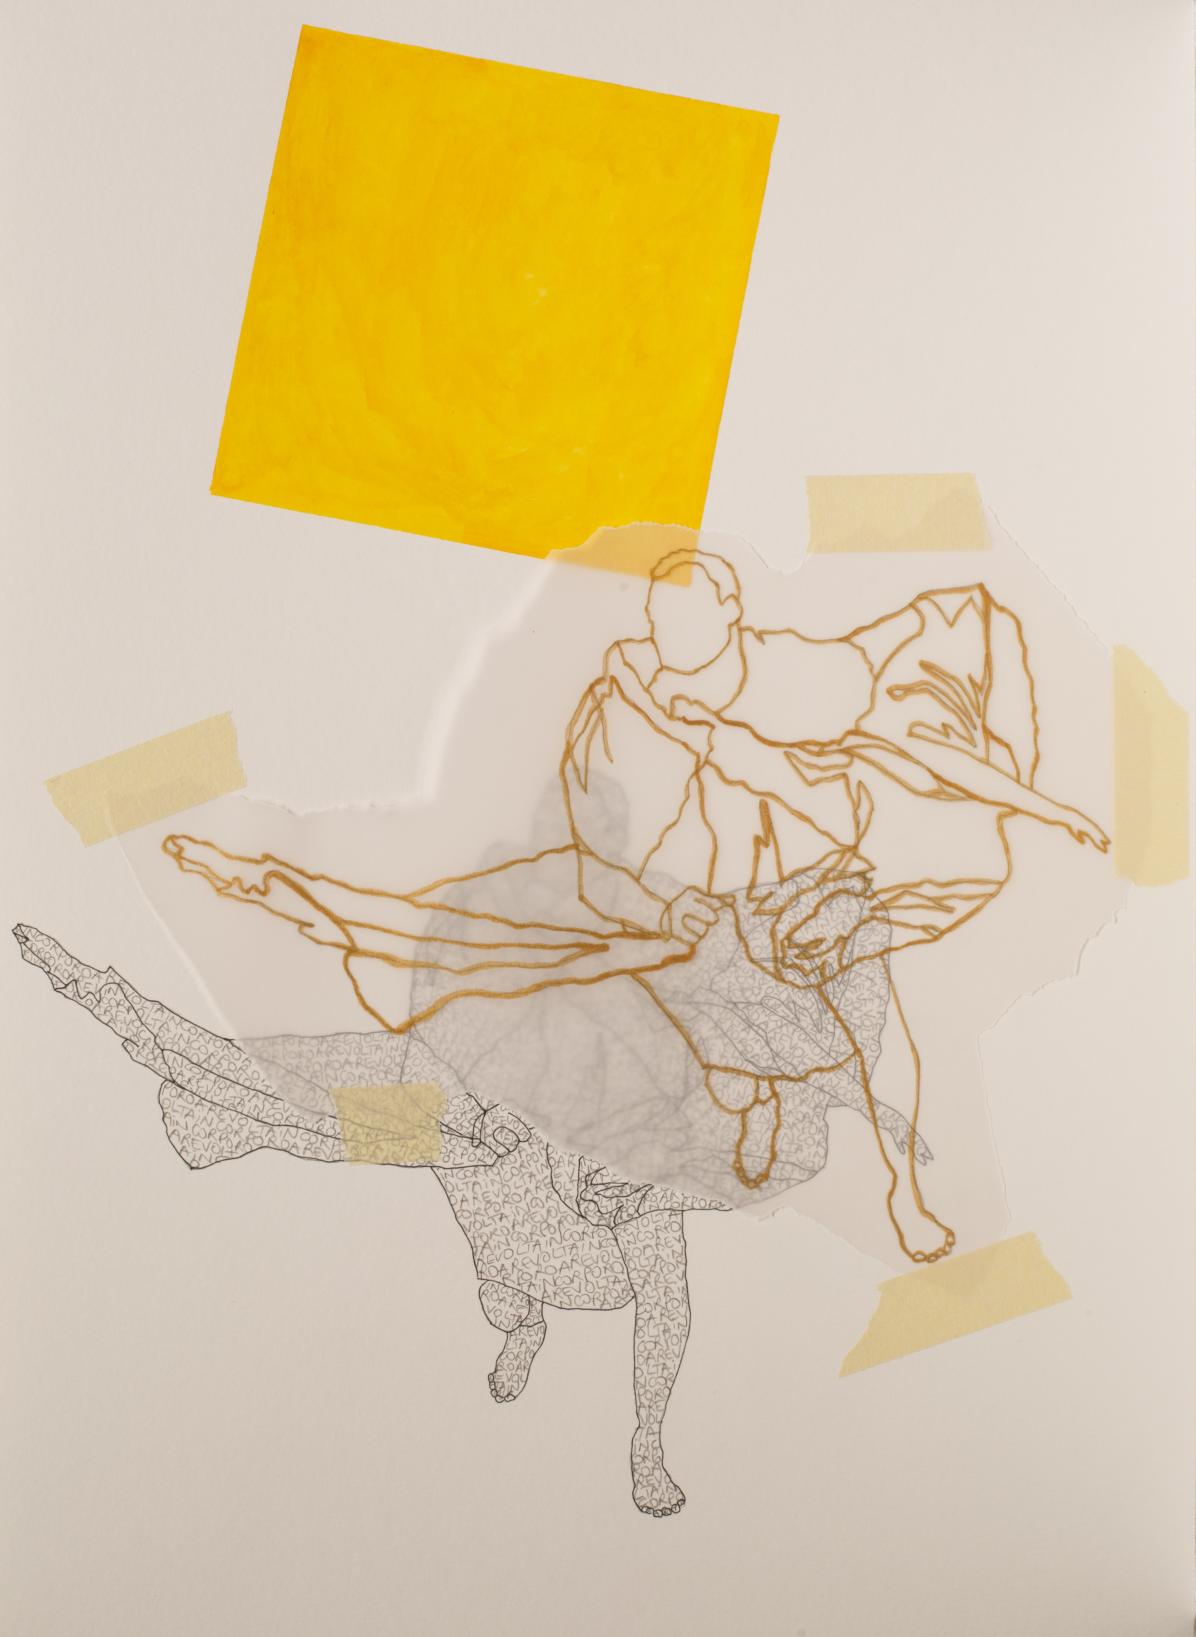 Notas al pie: La revuelta (con Hélio Oiticica) #1 (2020) - Cabello/Carceller